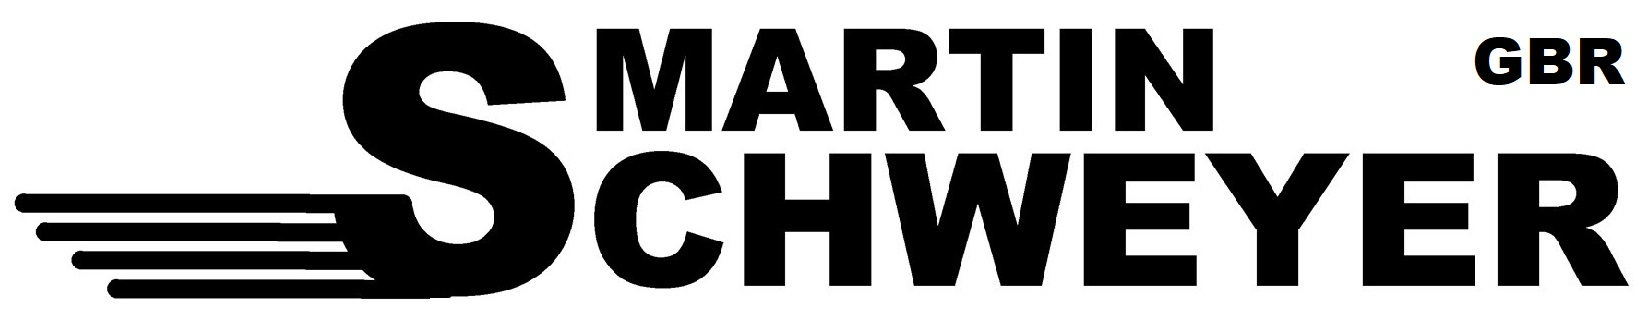 Martin Schweyer GbR